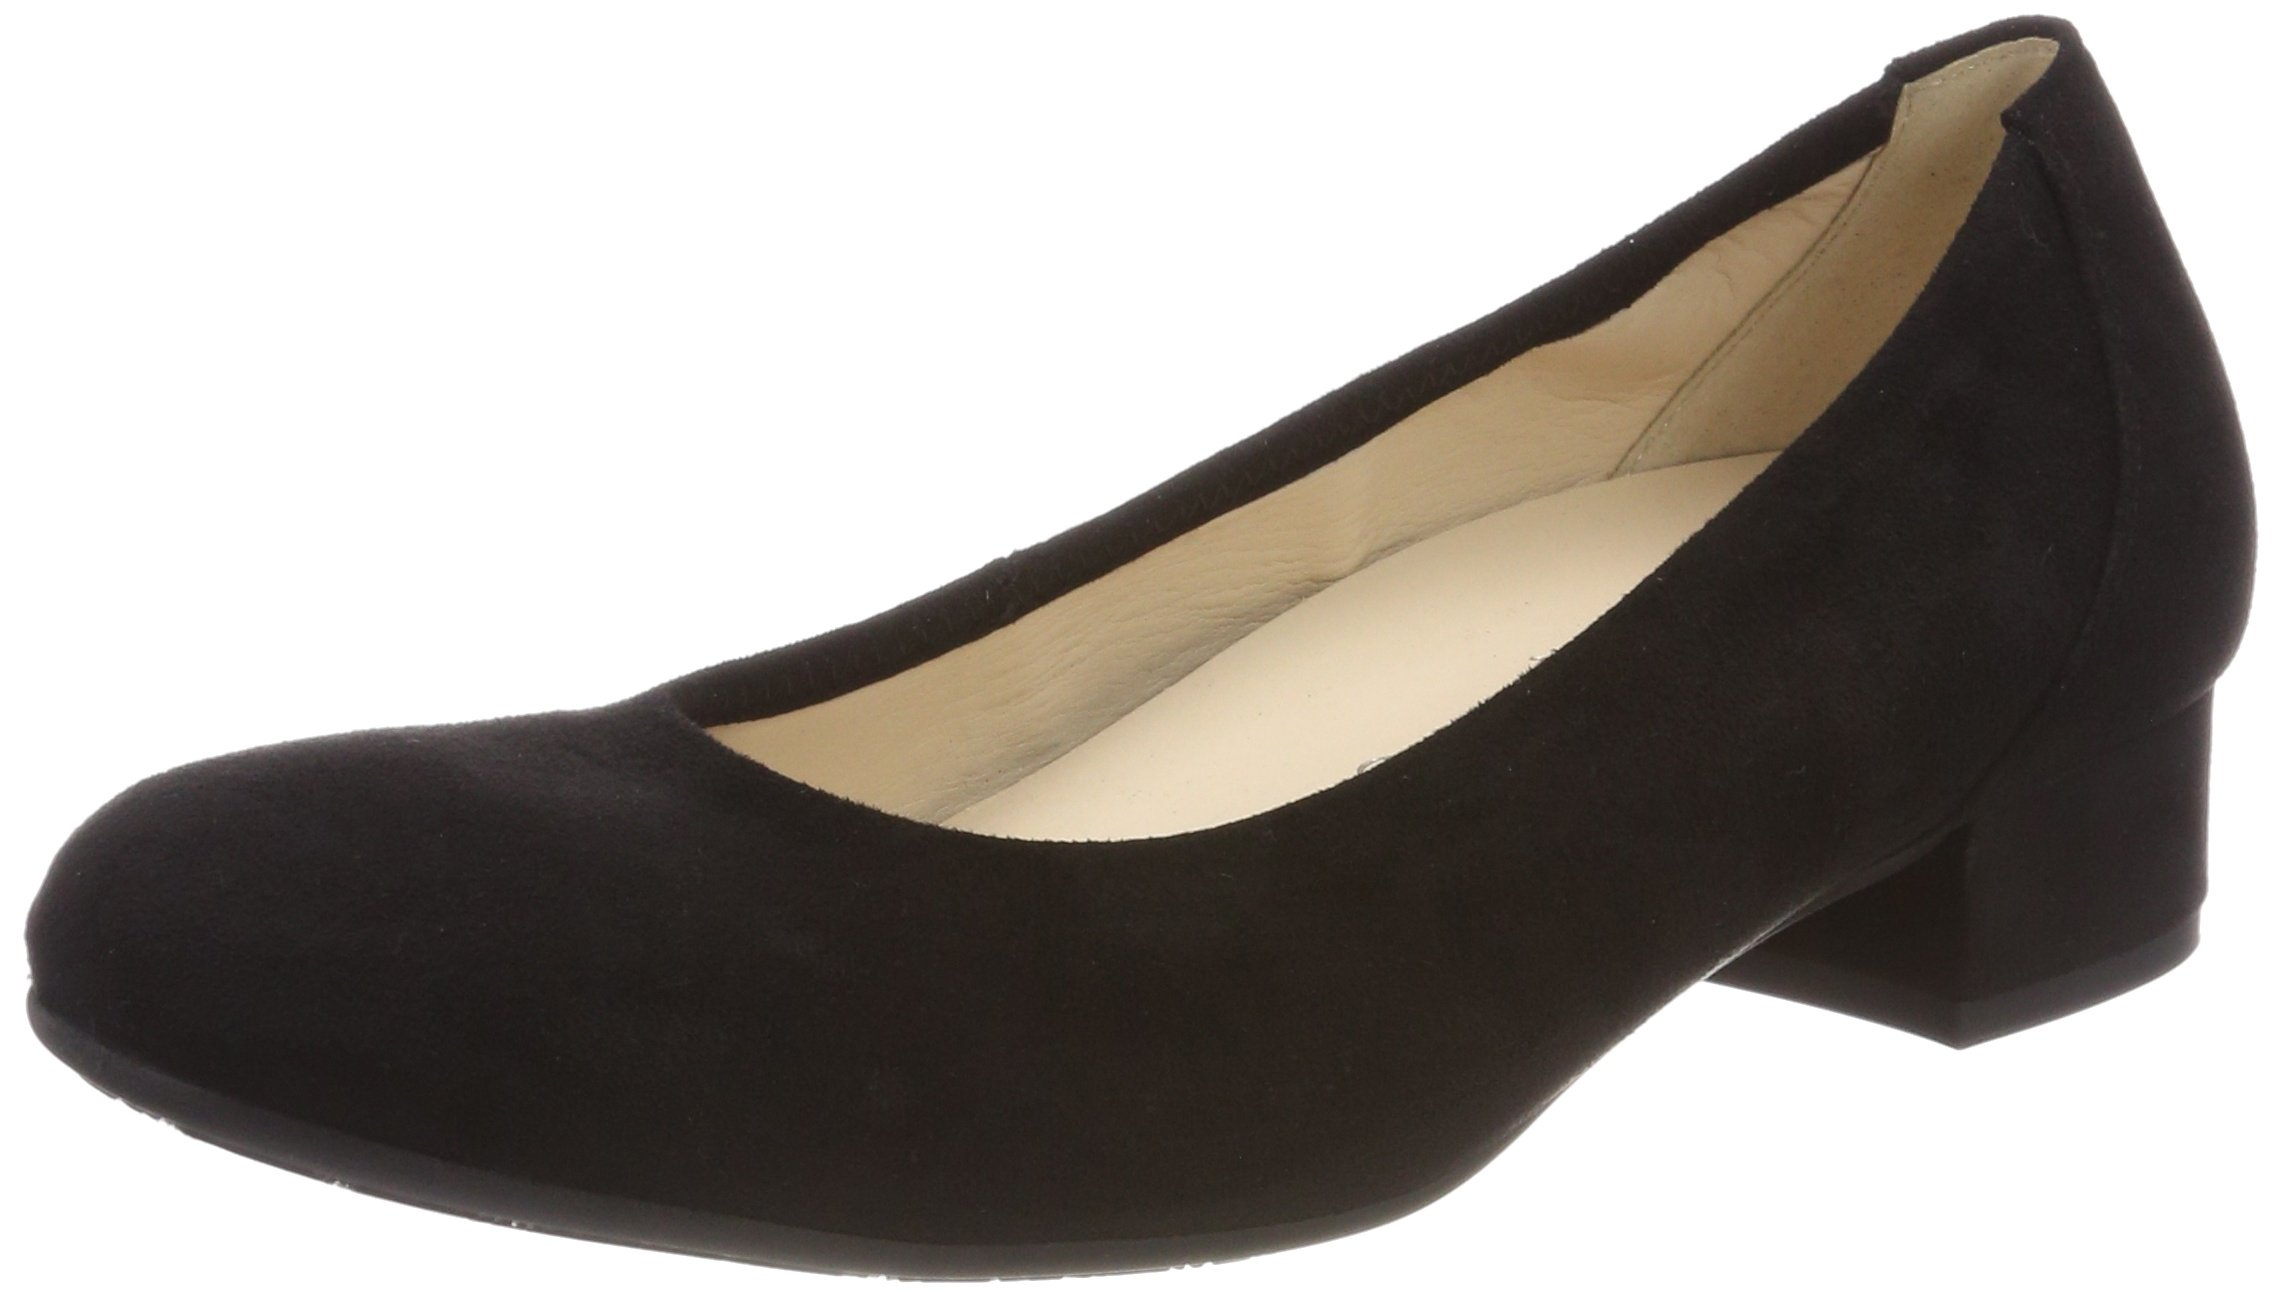 Comfort FemmeNoirschwarz39 Gabor Eu Shoes BasicEscarpins deCBox